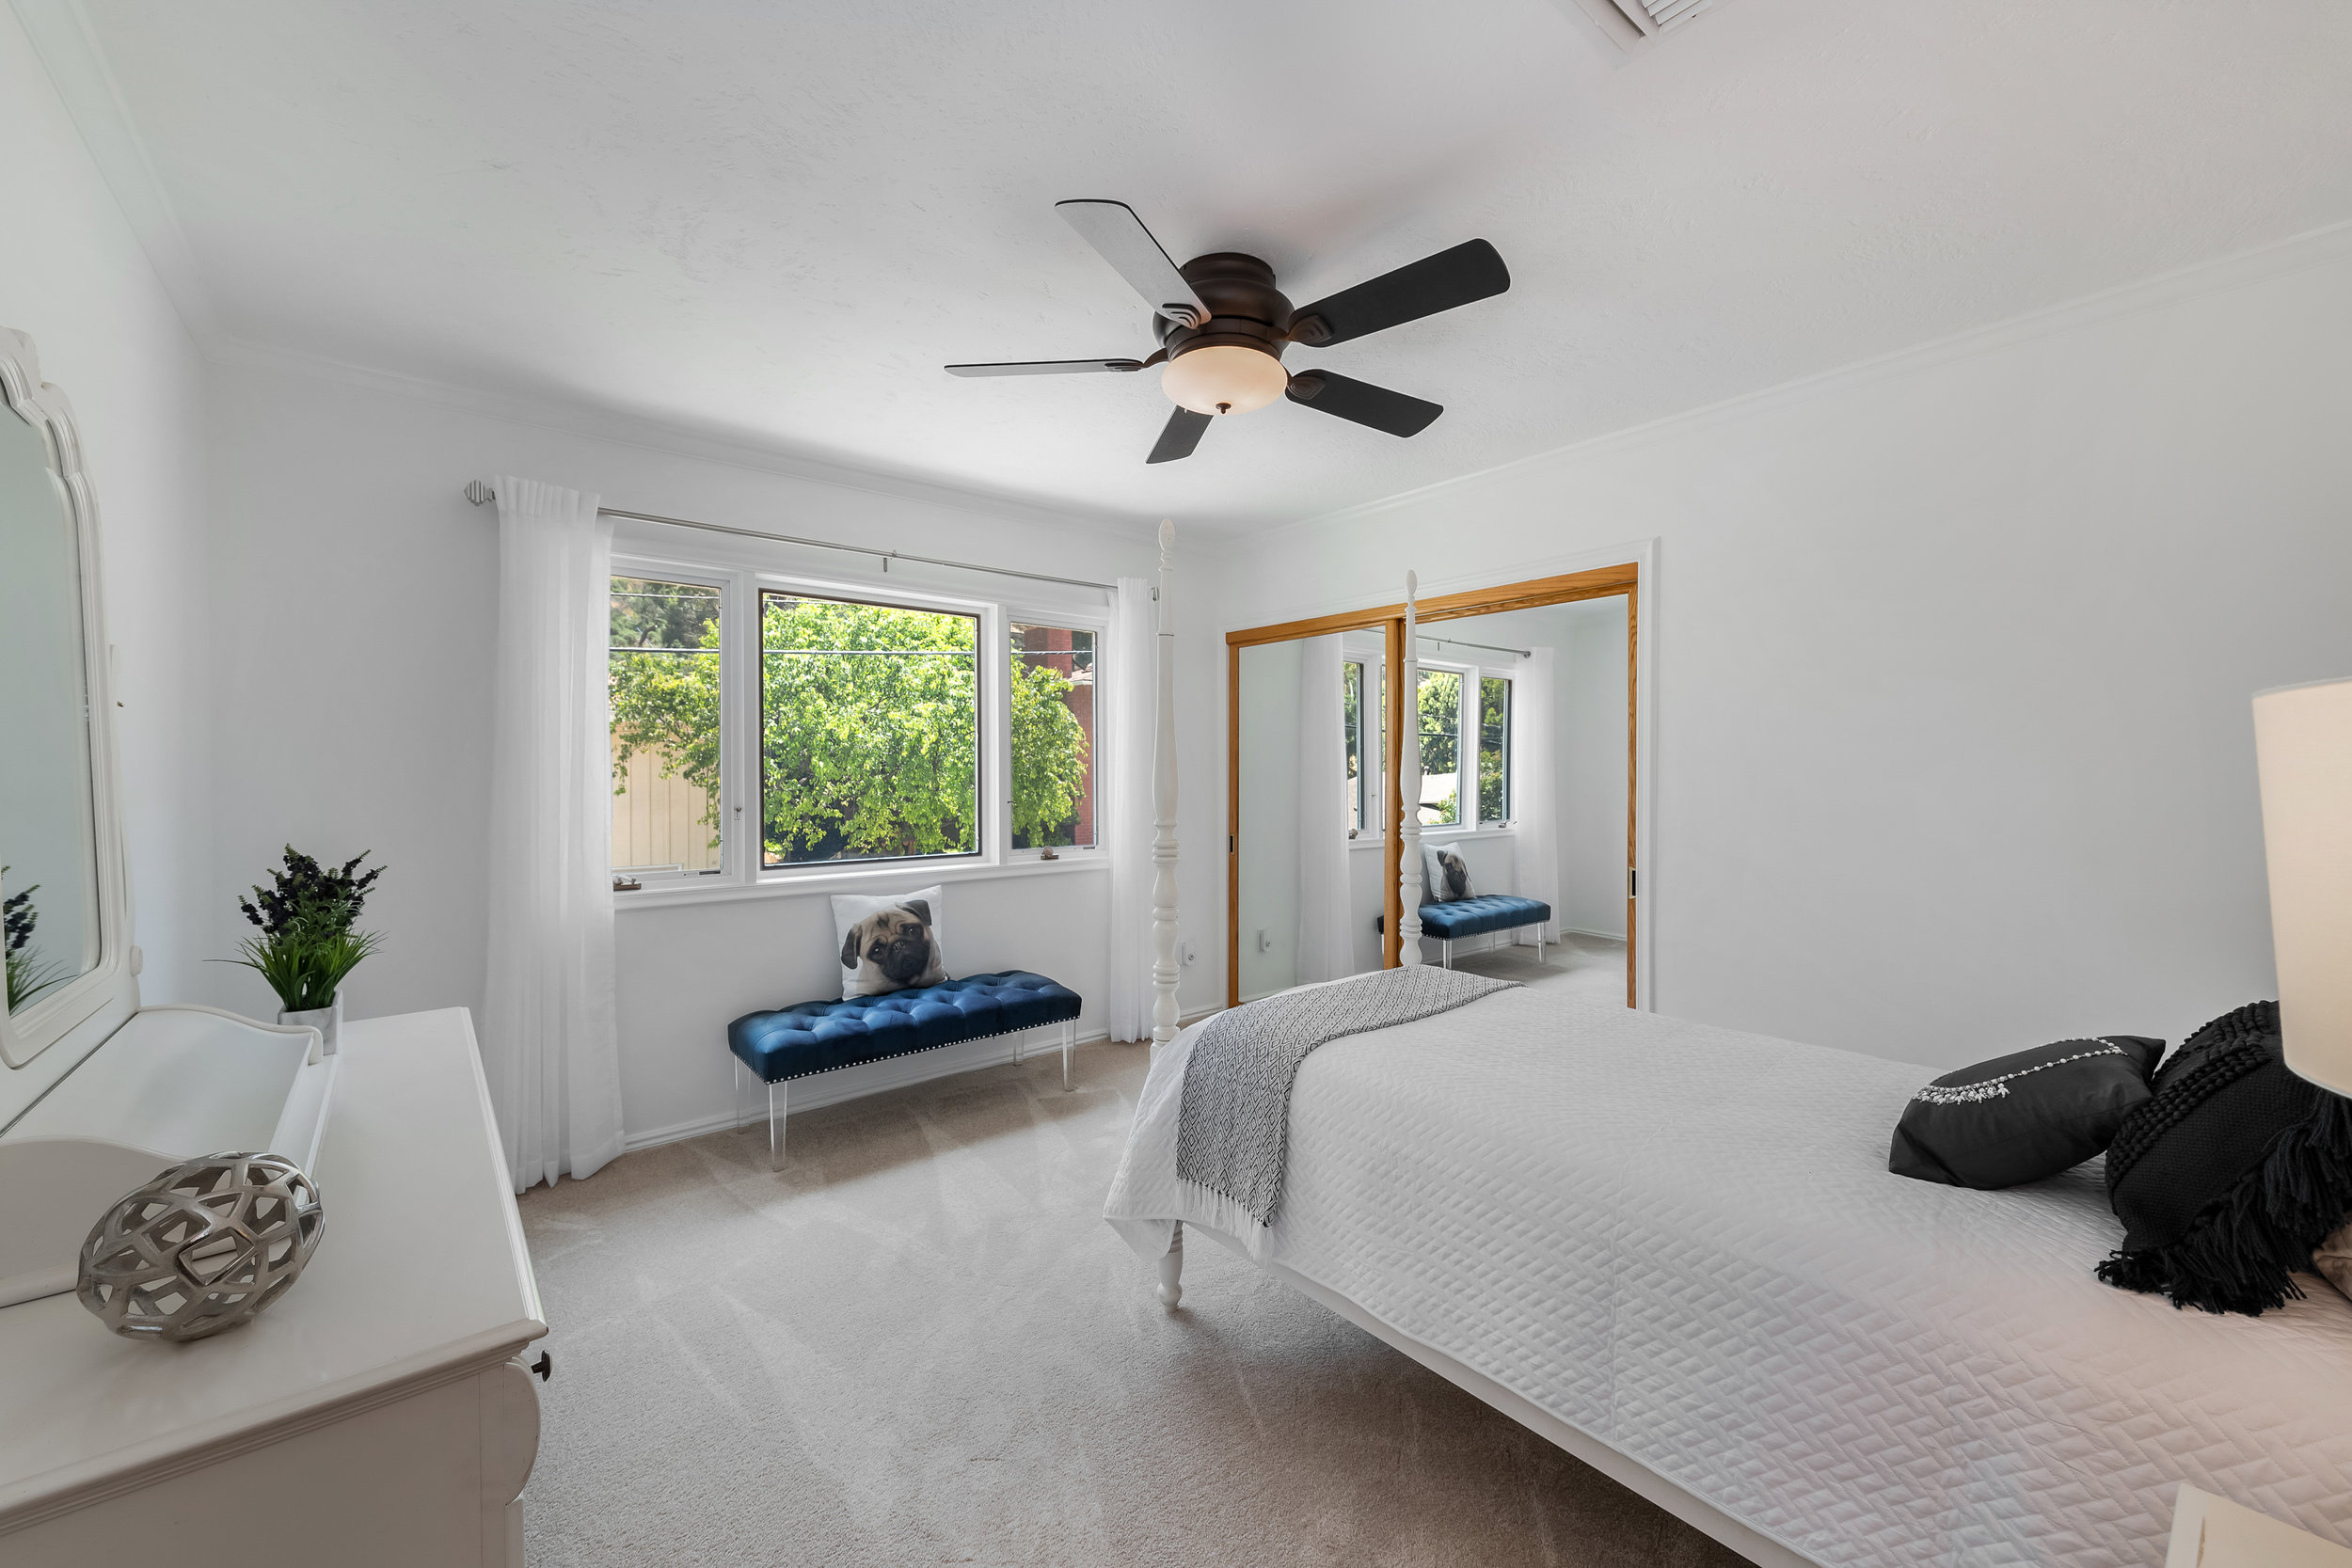 33 Bedroom 3.jpg